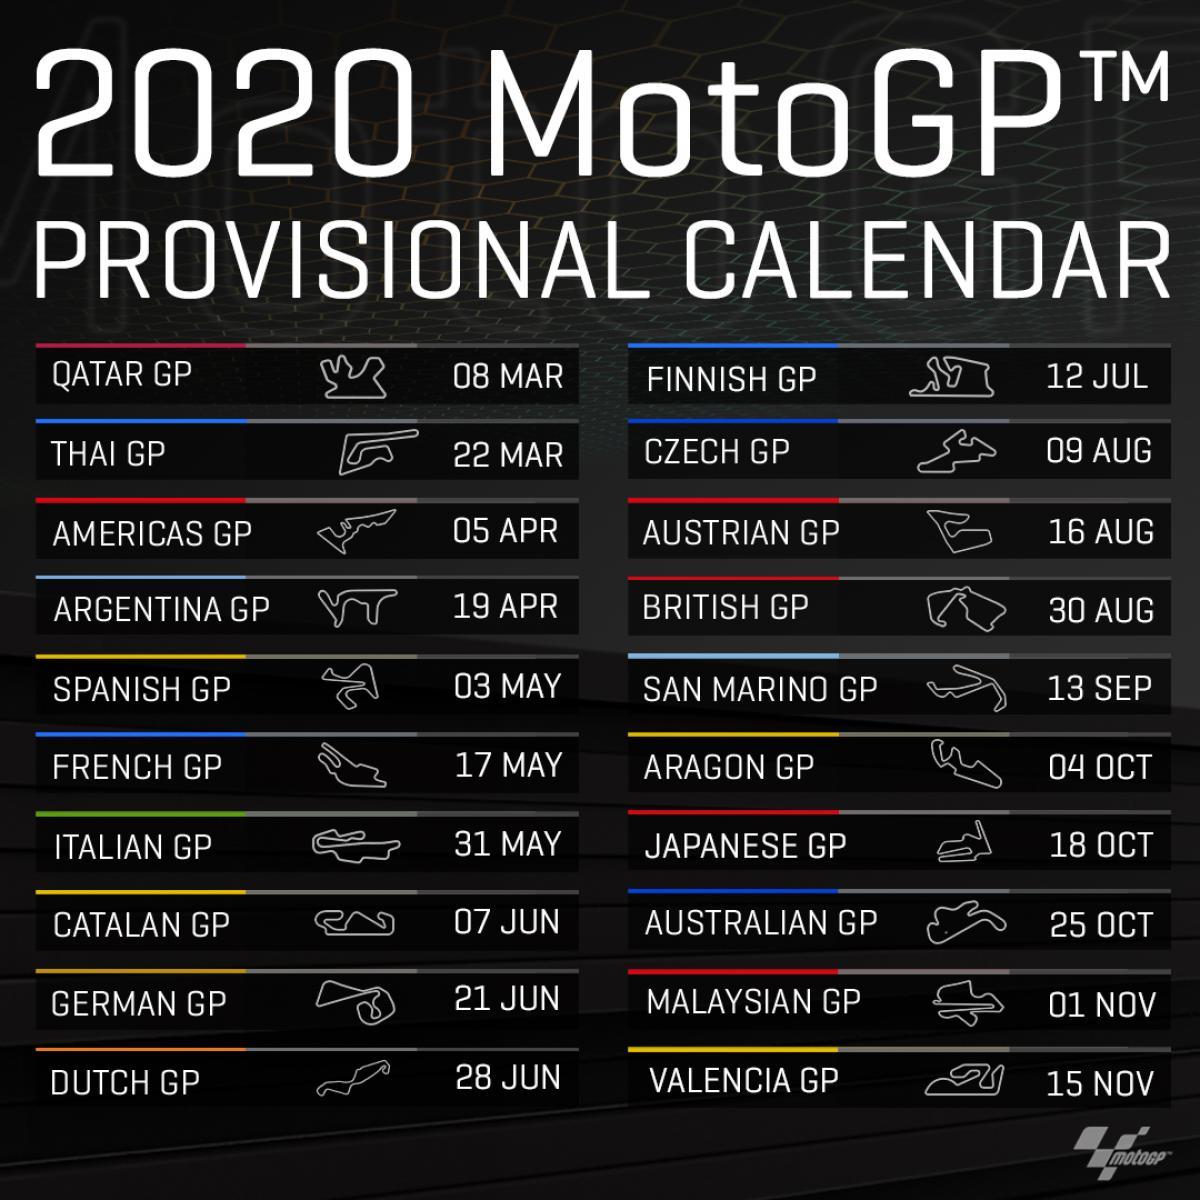 Calendario Moto 2020.Motogp Calendario Provisorio De 2020 E Divulgado Veja As